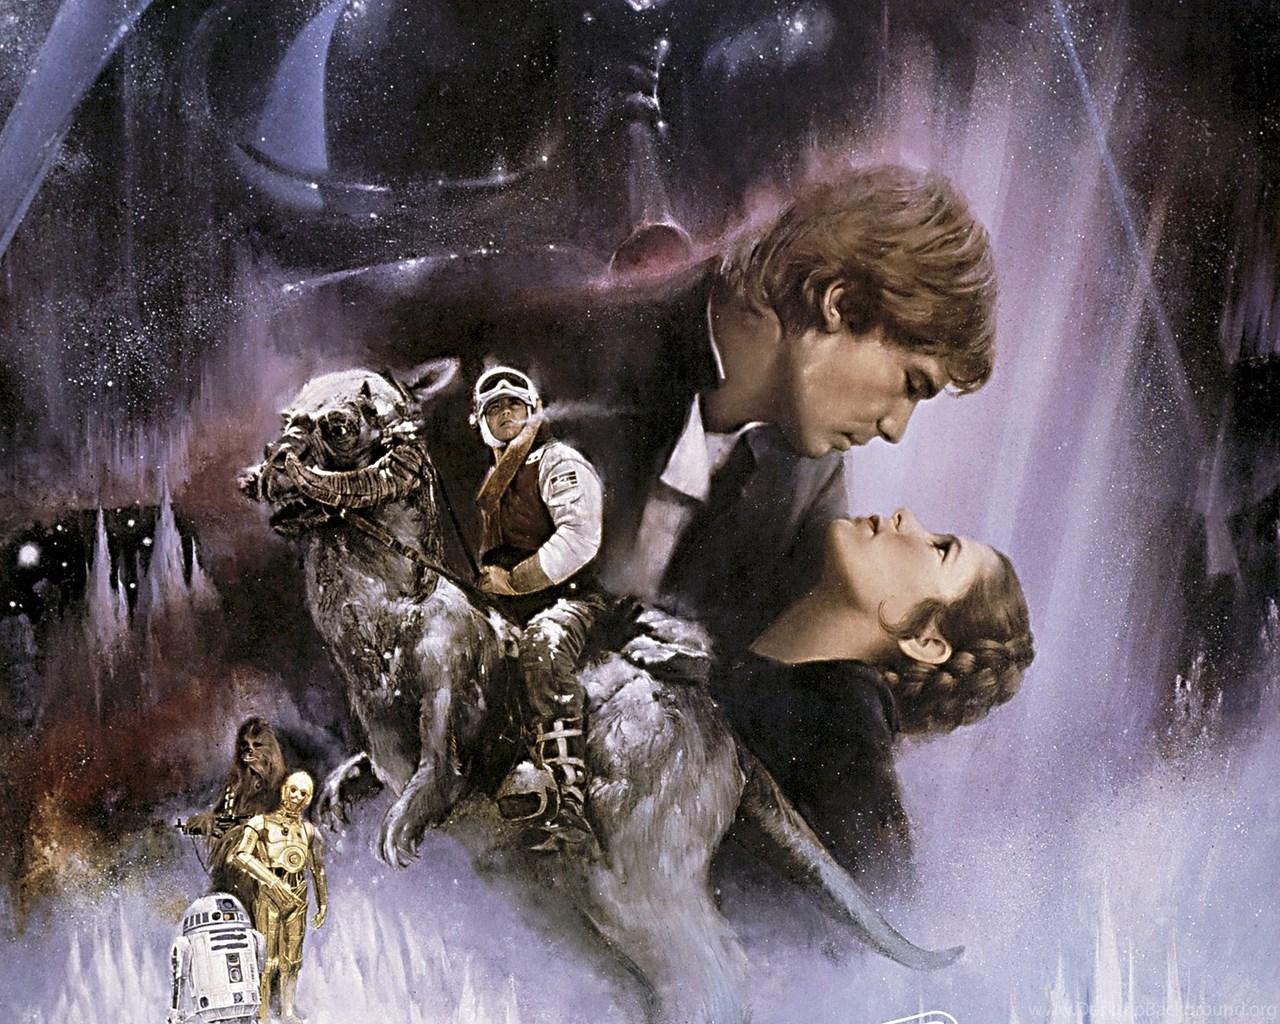 41 Star Wars Episode V The Empire Strikes Back Hd Wallpapers Desktop Background